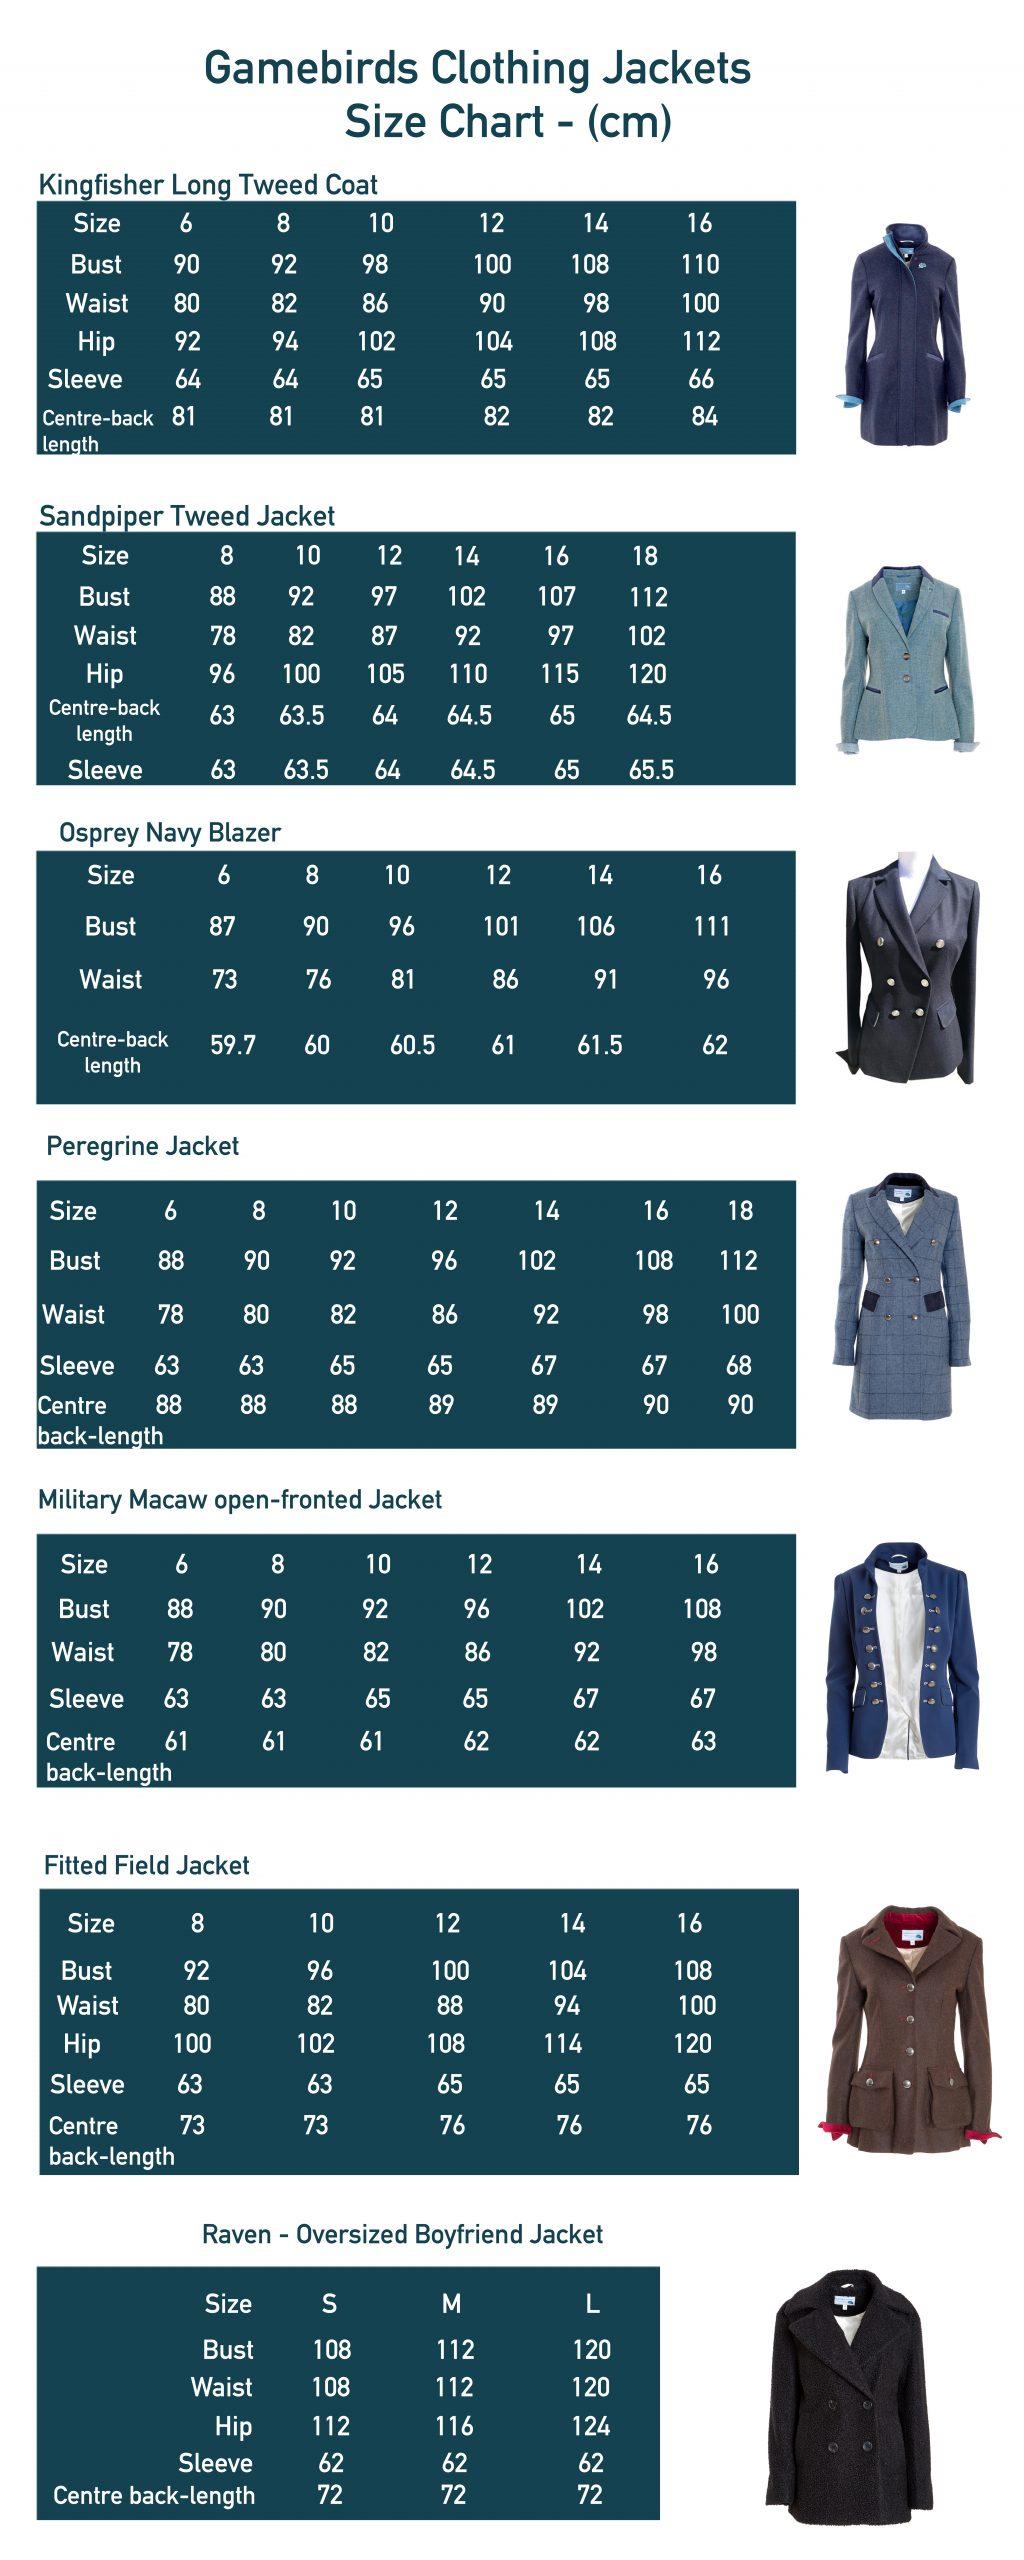 Gamebirds Clothing Size Chart